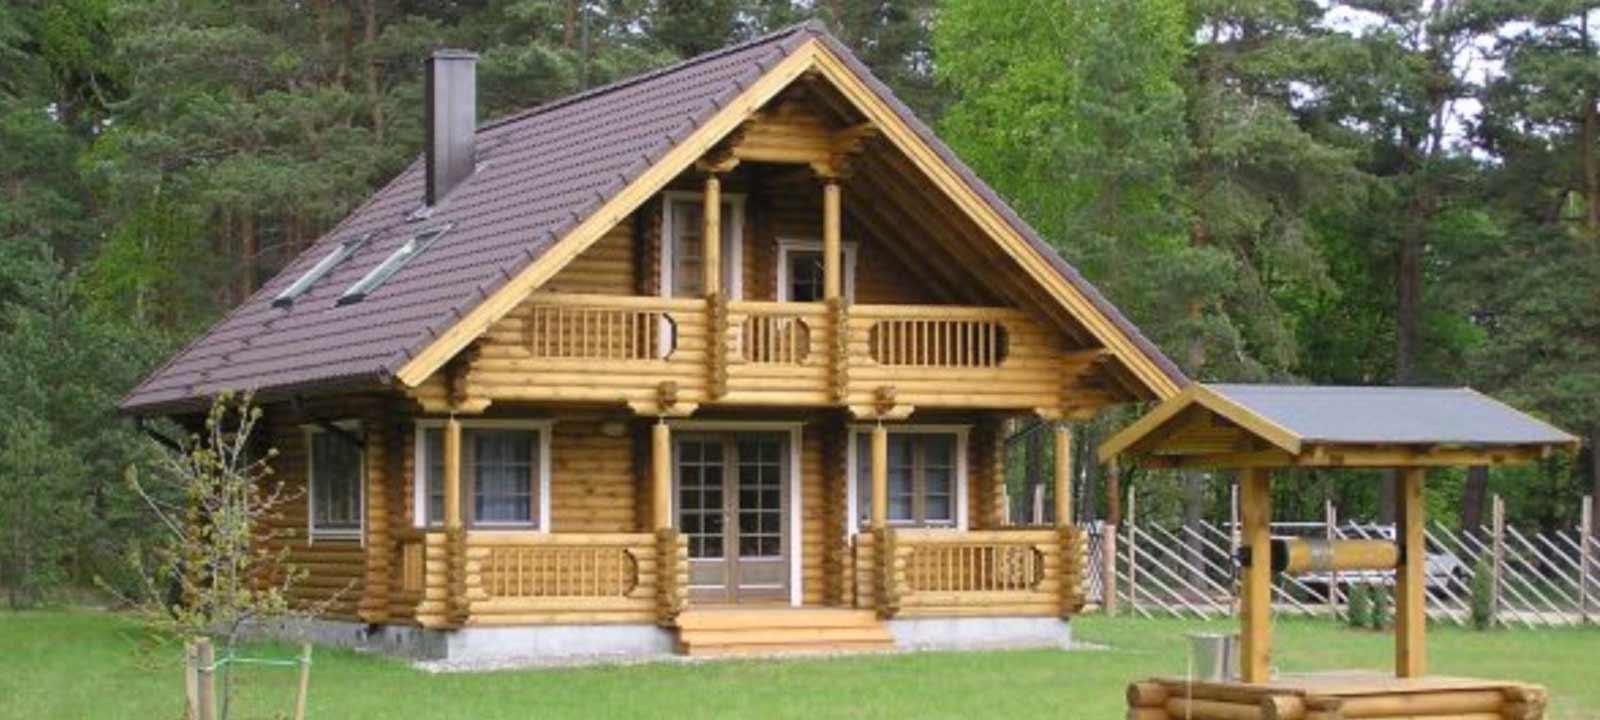 WoodVille Design Blokhut MtBLANC RLR 114M2